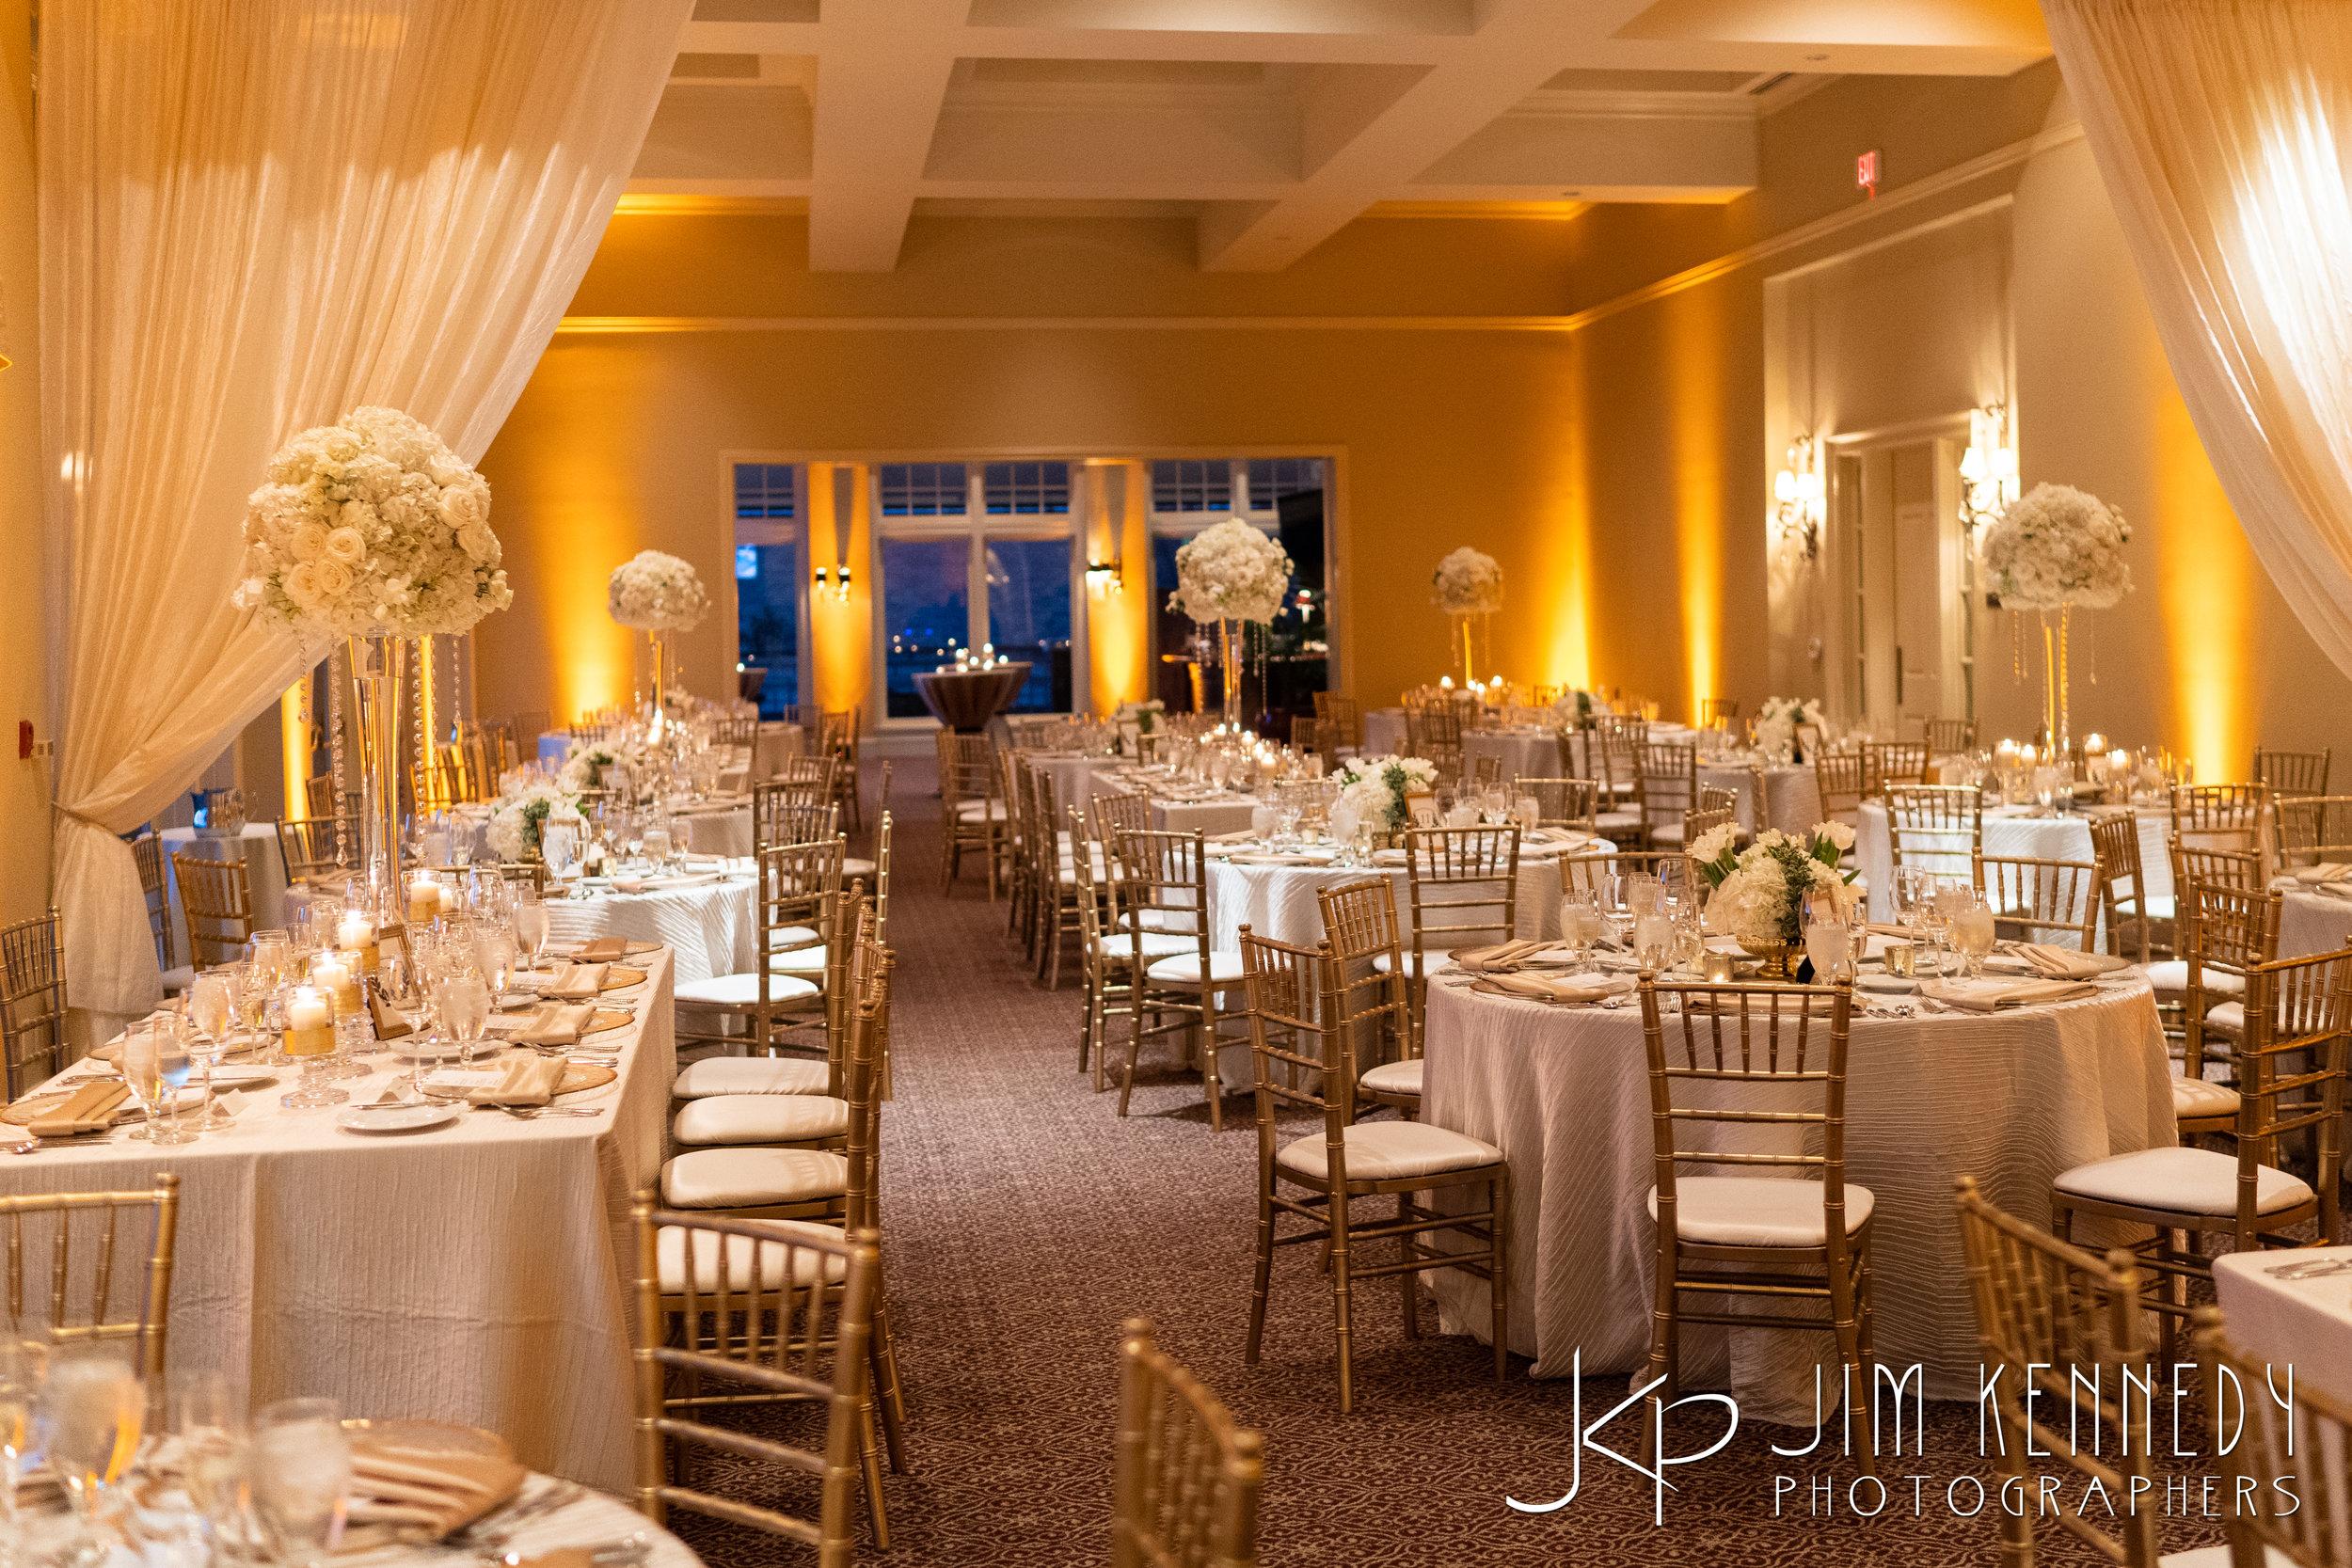 sherwood_country_club_wedding-2891.jpg